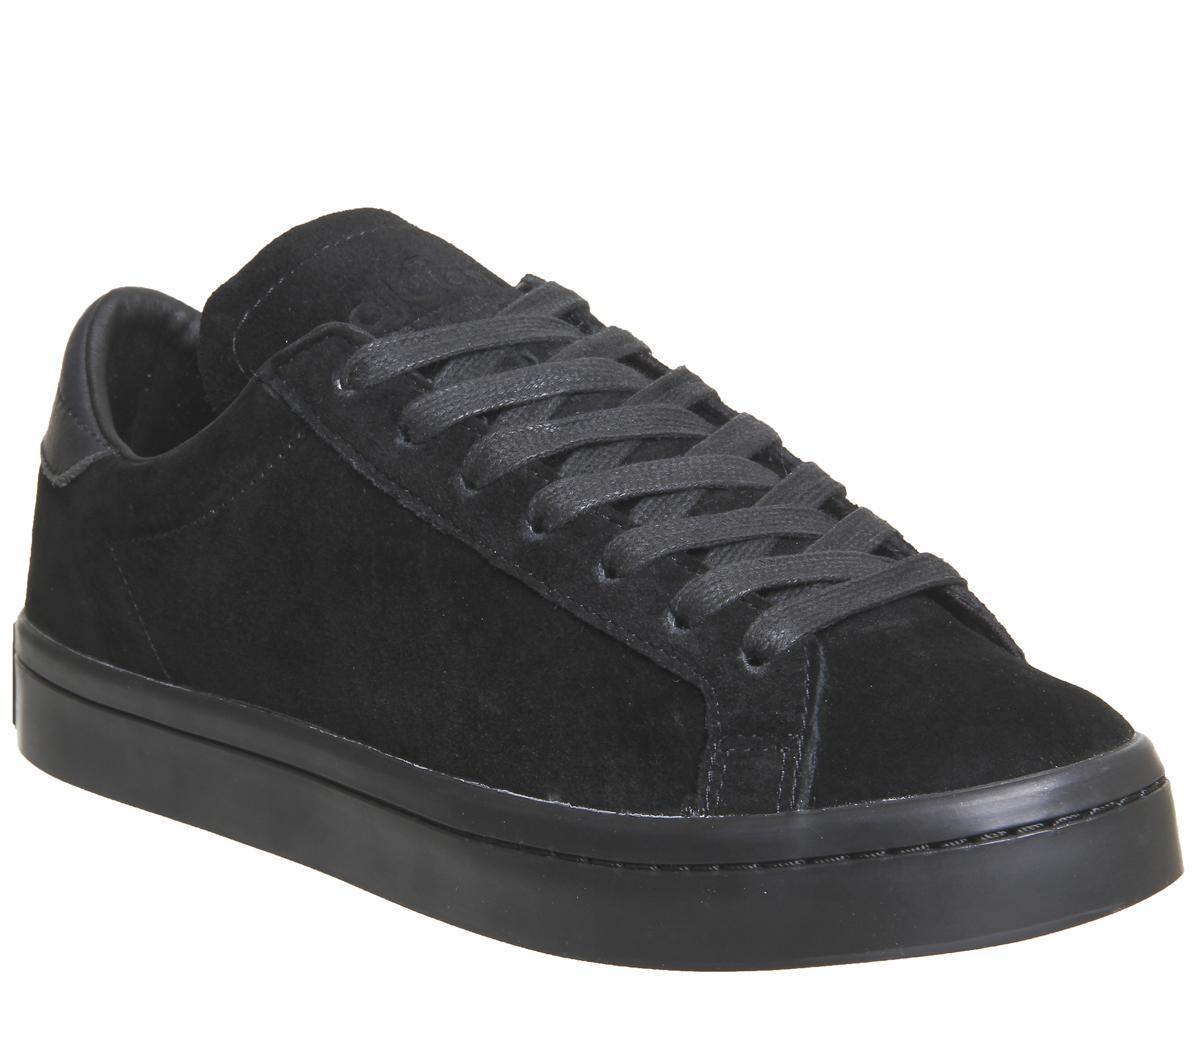 adidas Court Vantage Trainers Black